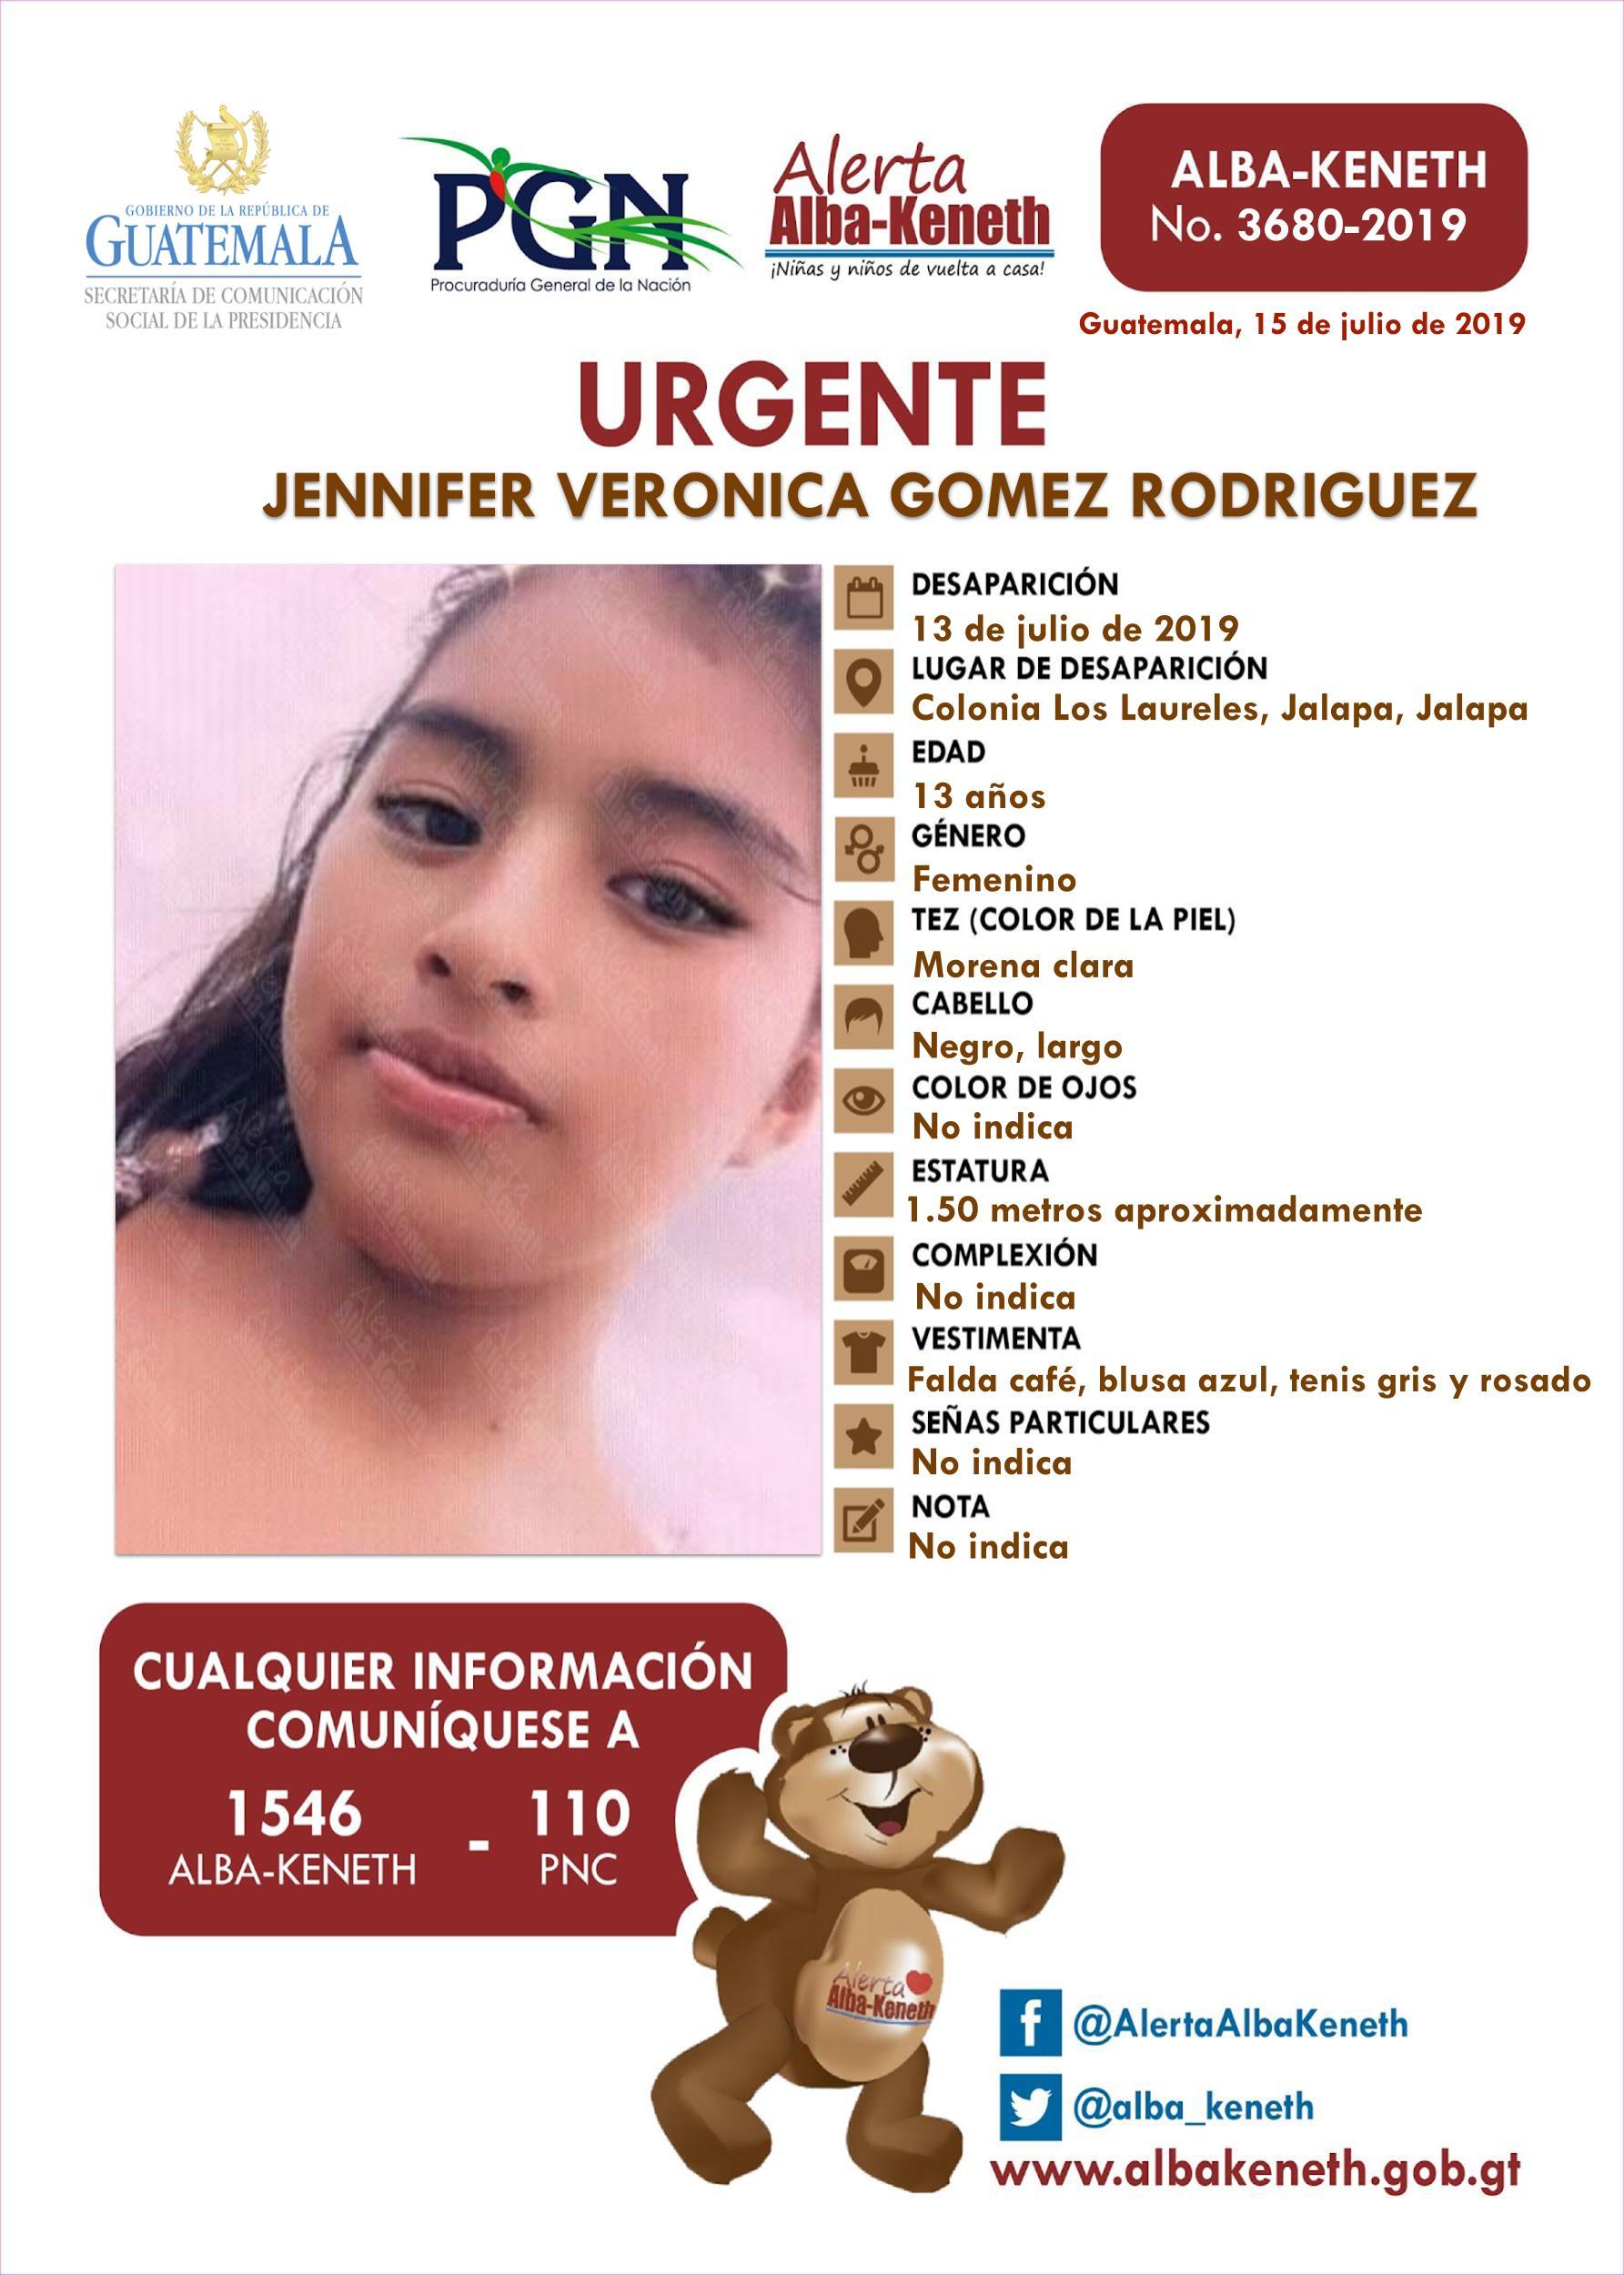 Jennifer Veronica Gomez Rodriguez